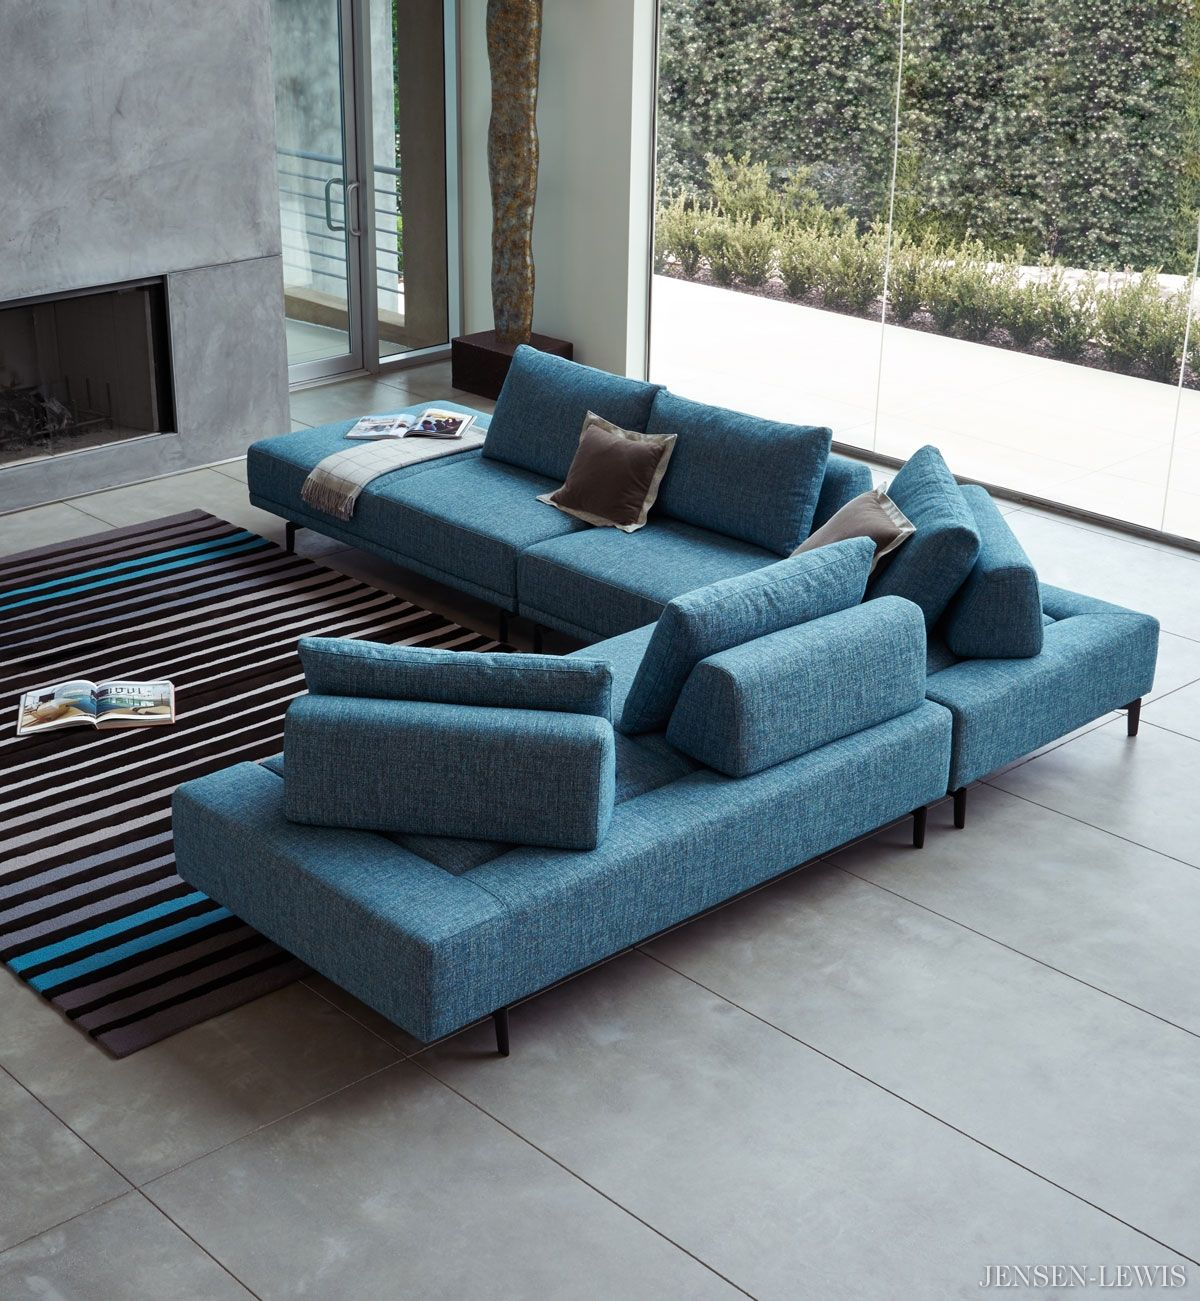 Dellarobbia Felix Modular Sectional Sofa Living Room Sofa Design